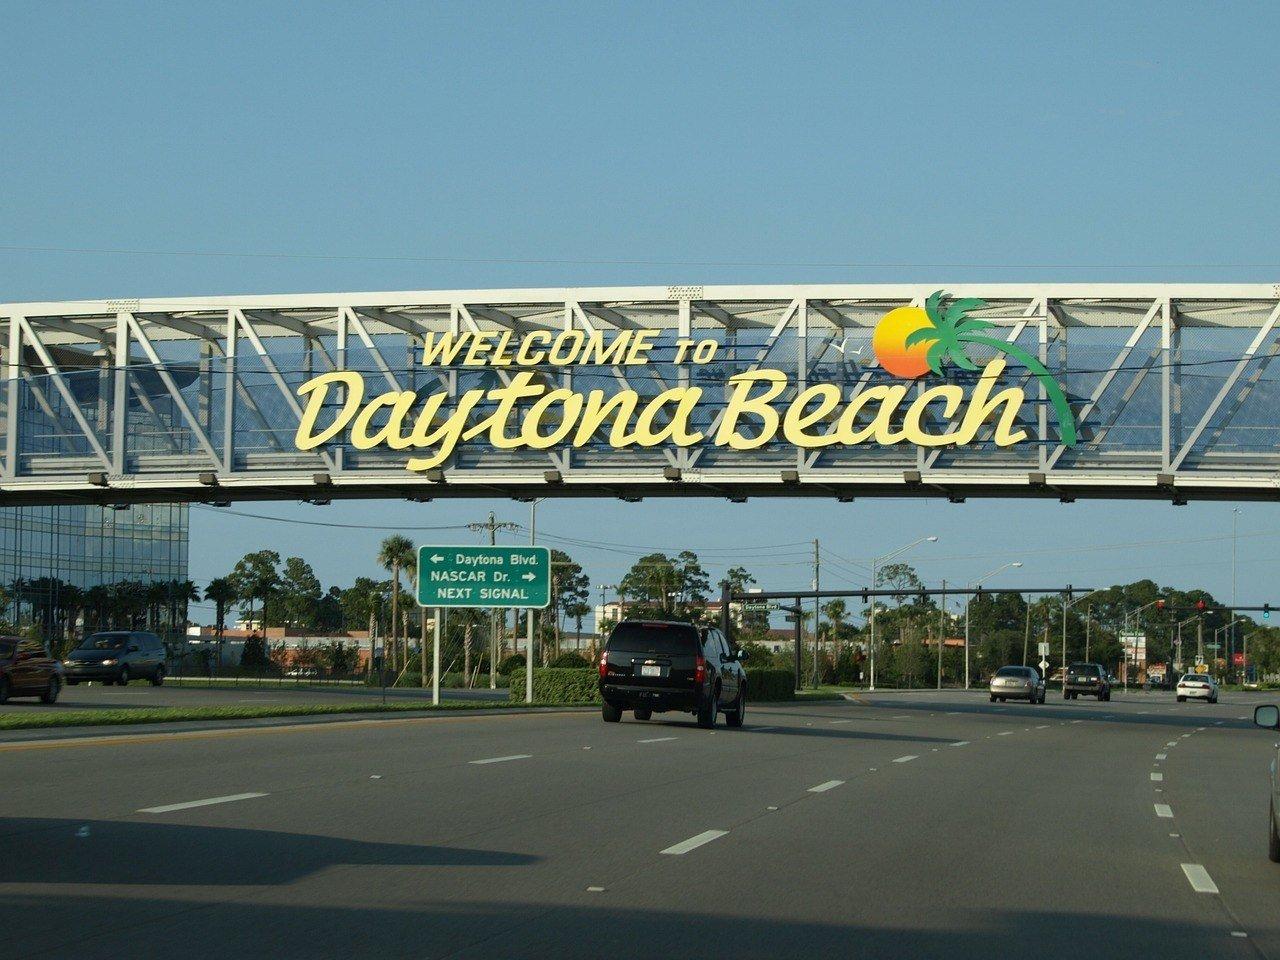 Daytona Beach - Daytona Beach